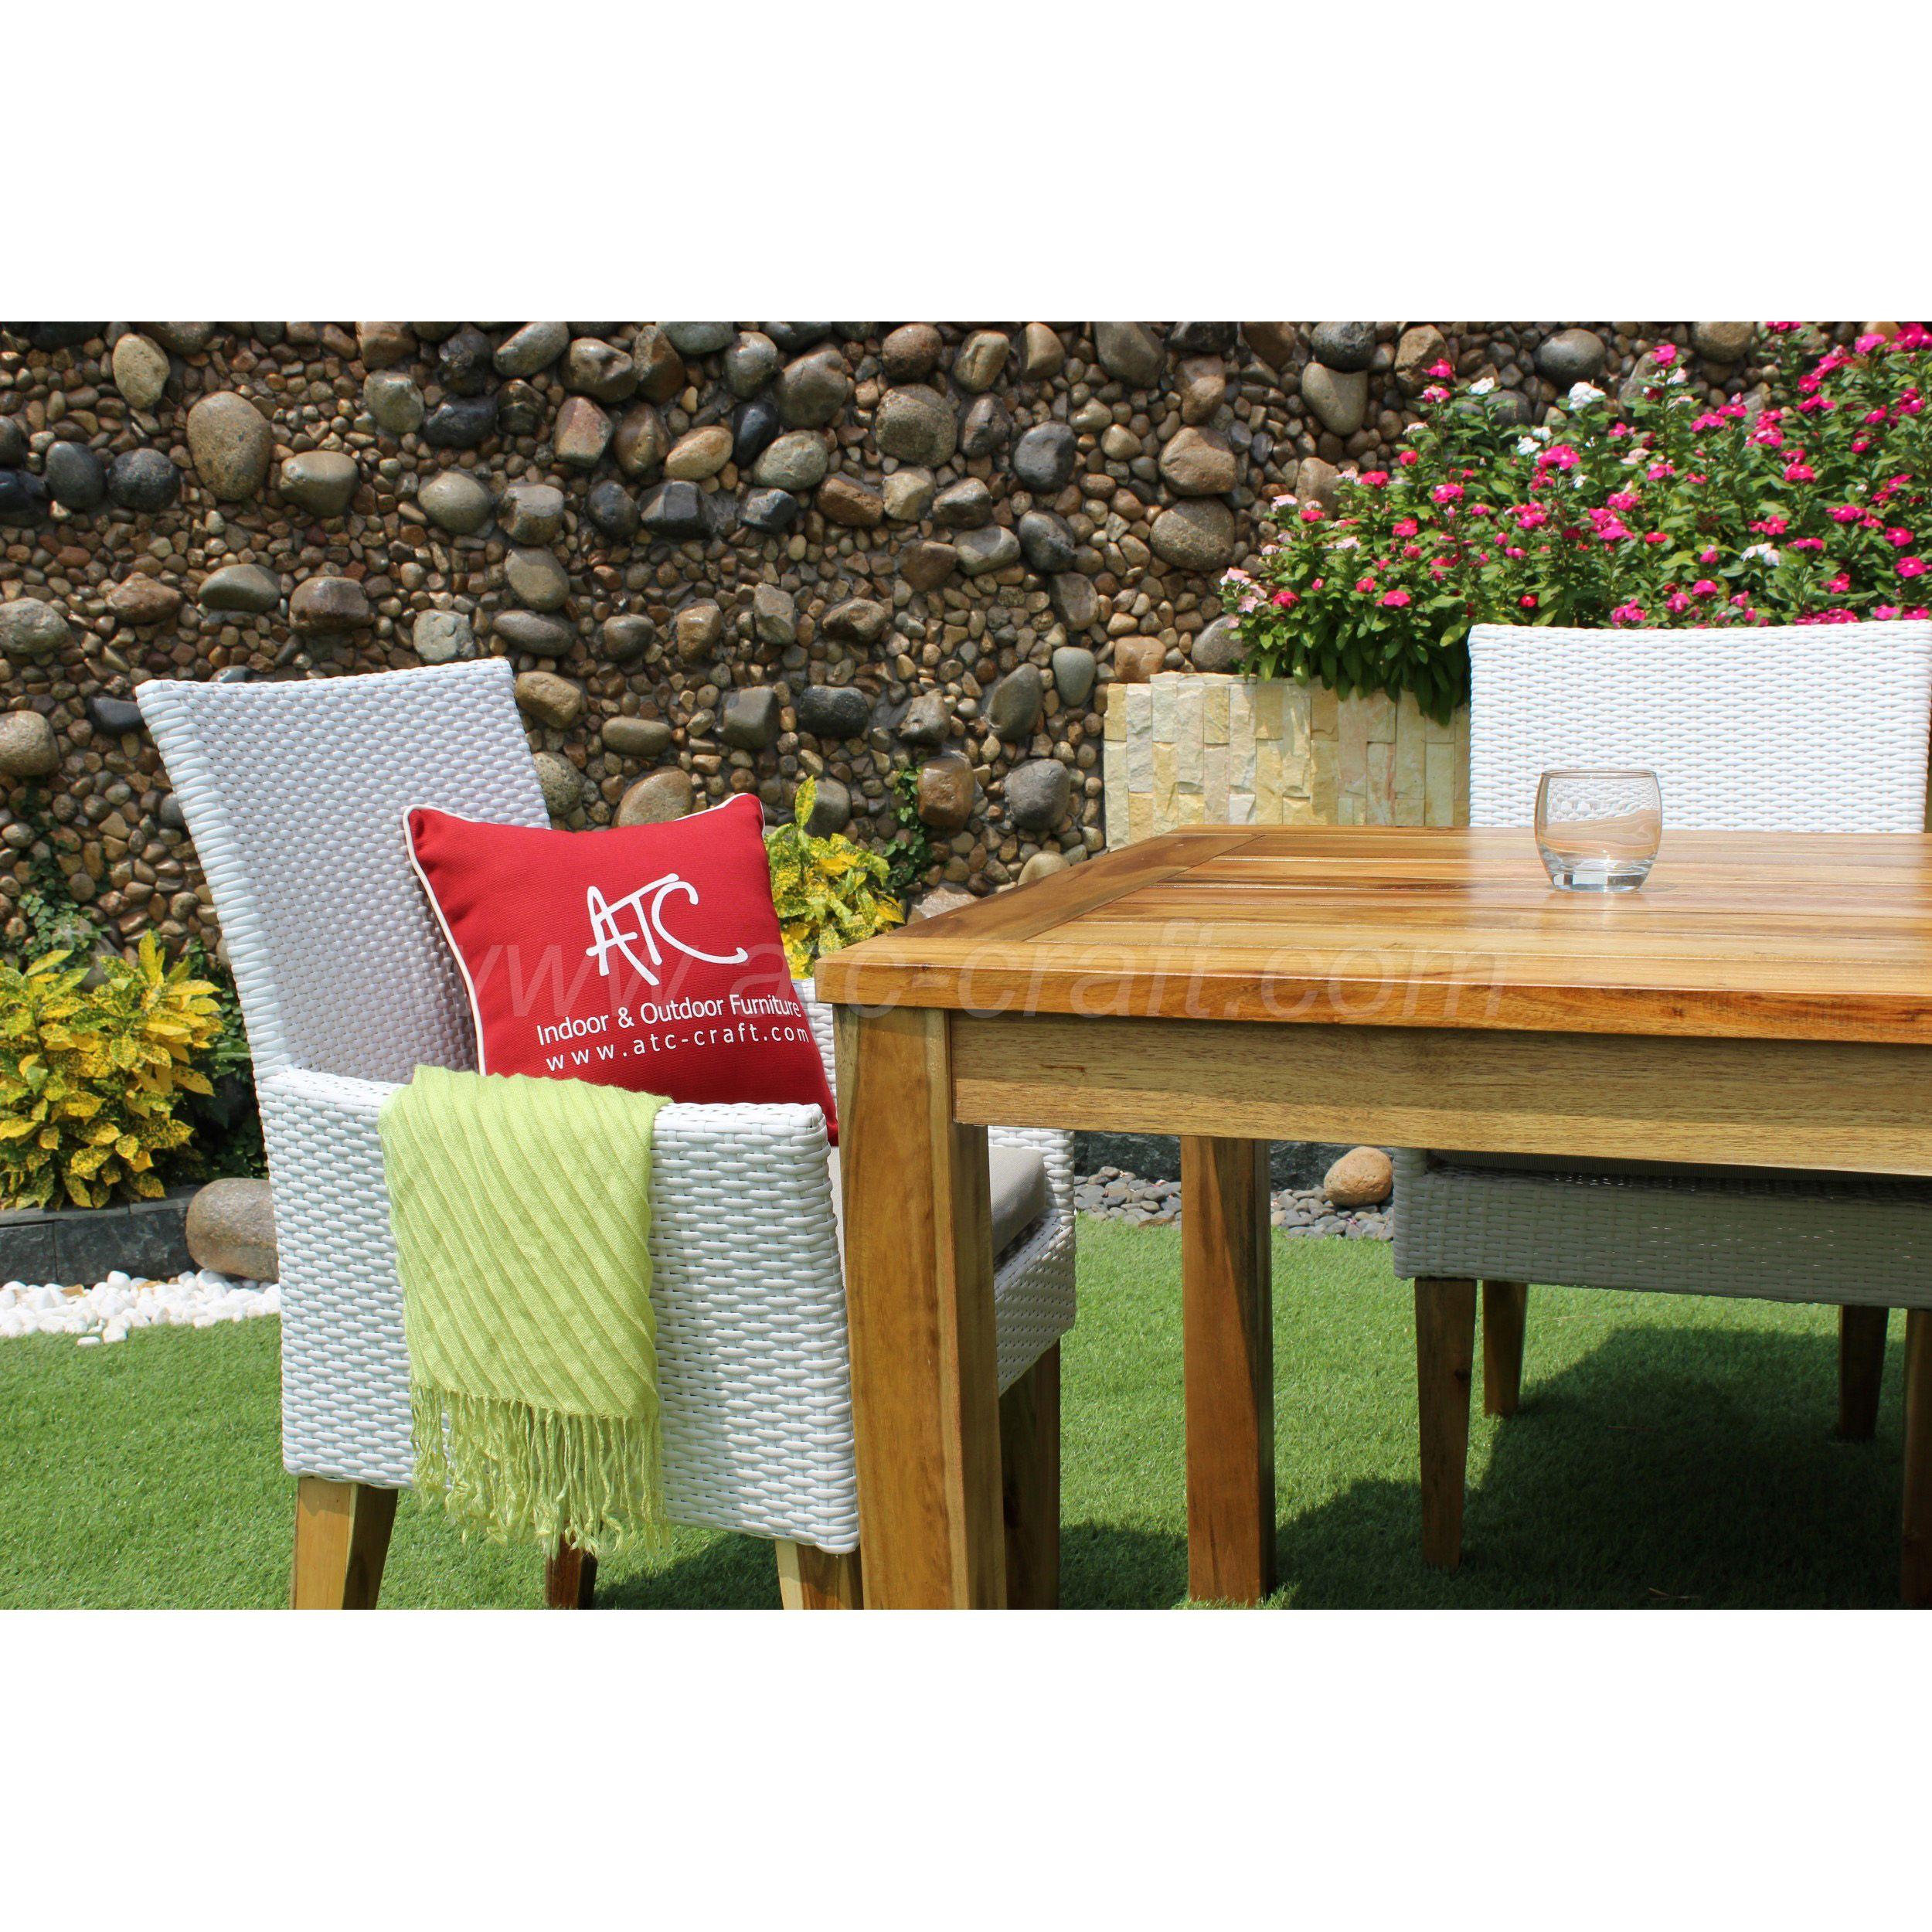 polyrattan sthle amazing daonanba combine style garden. Black Bedroom Furniture Sets. Home Design Ideas